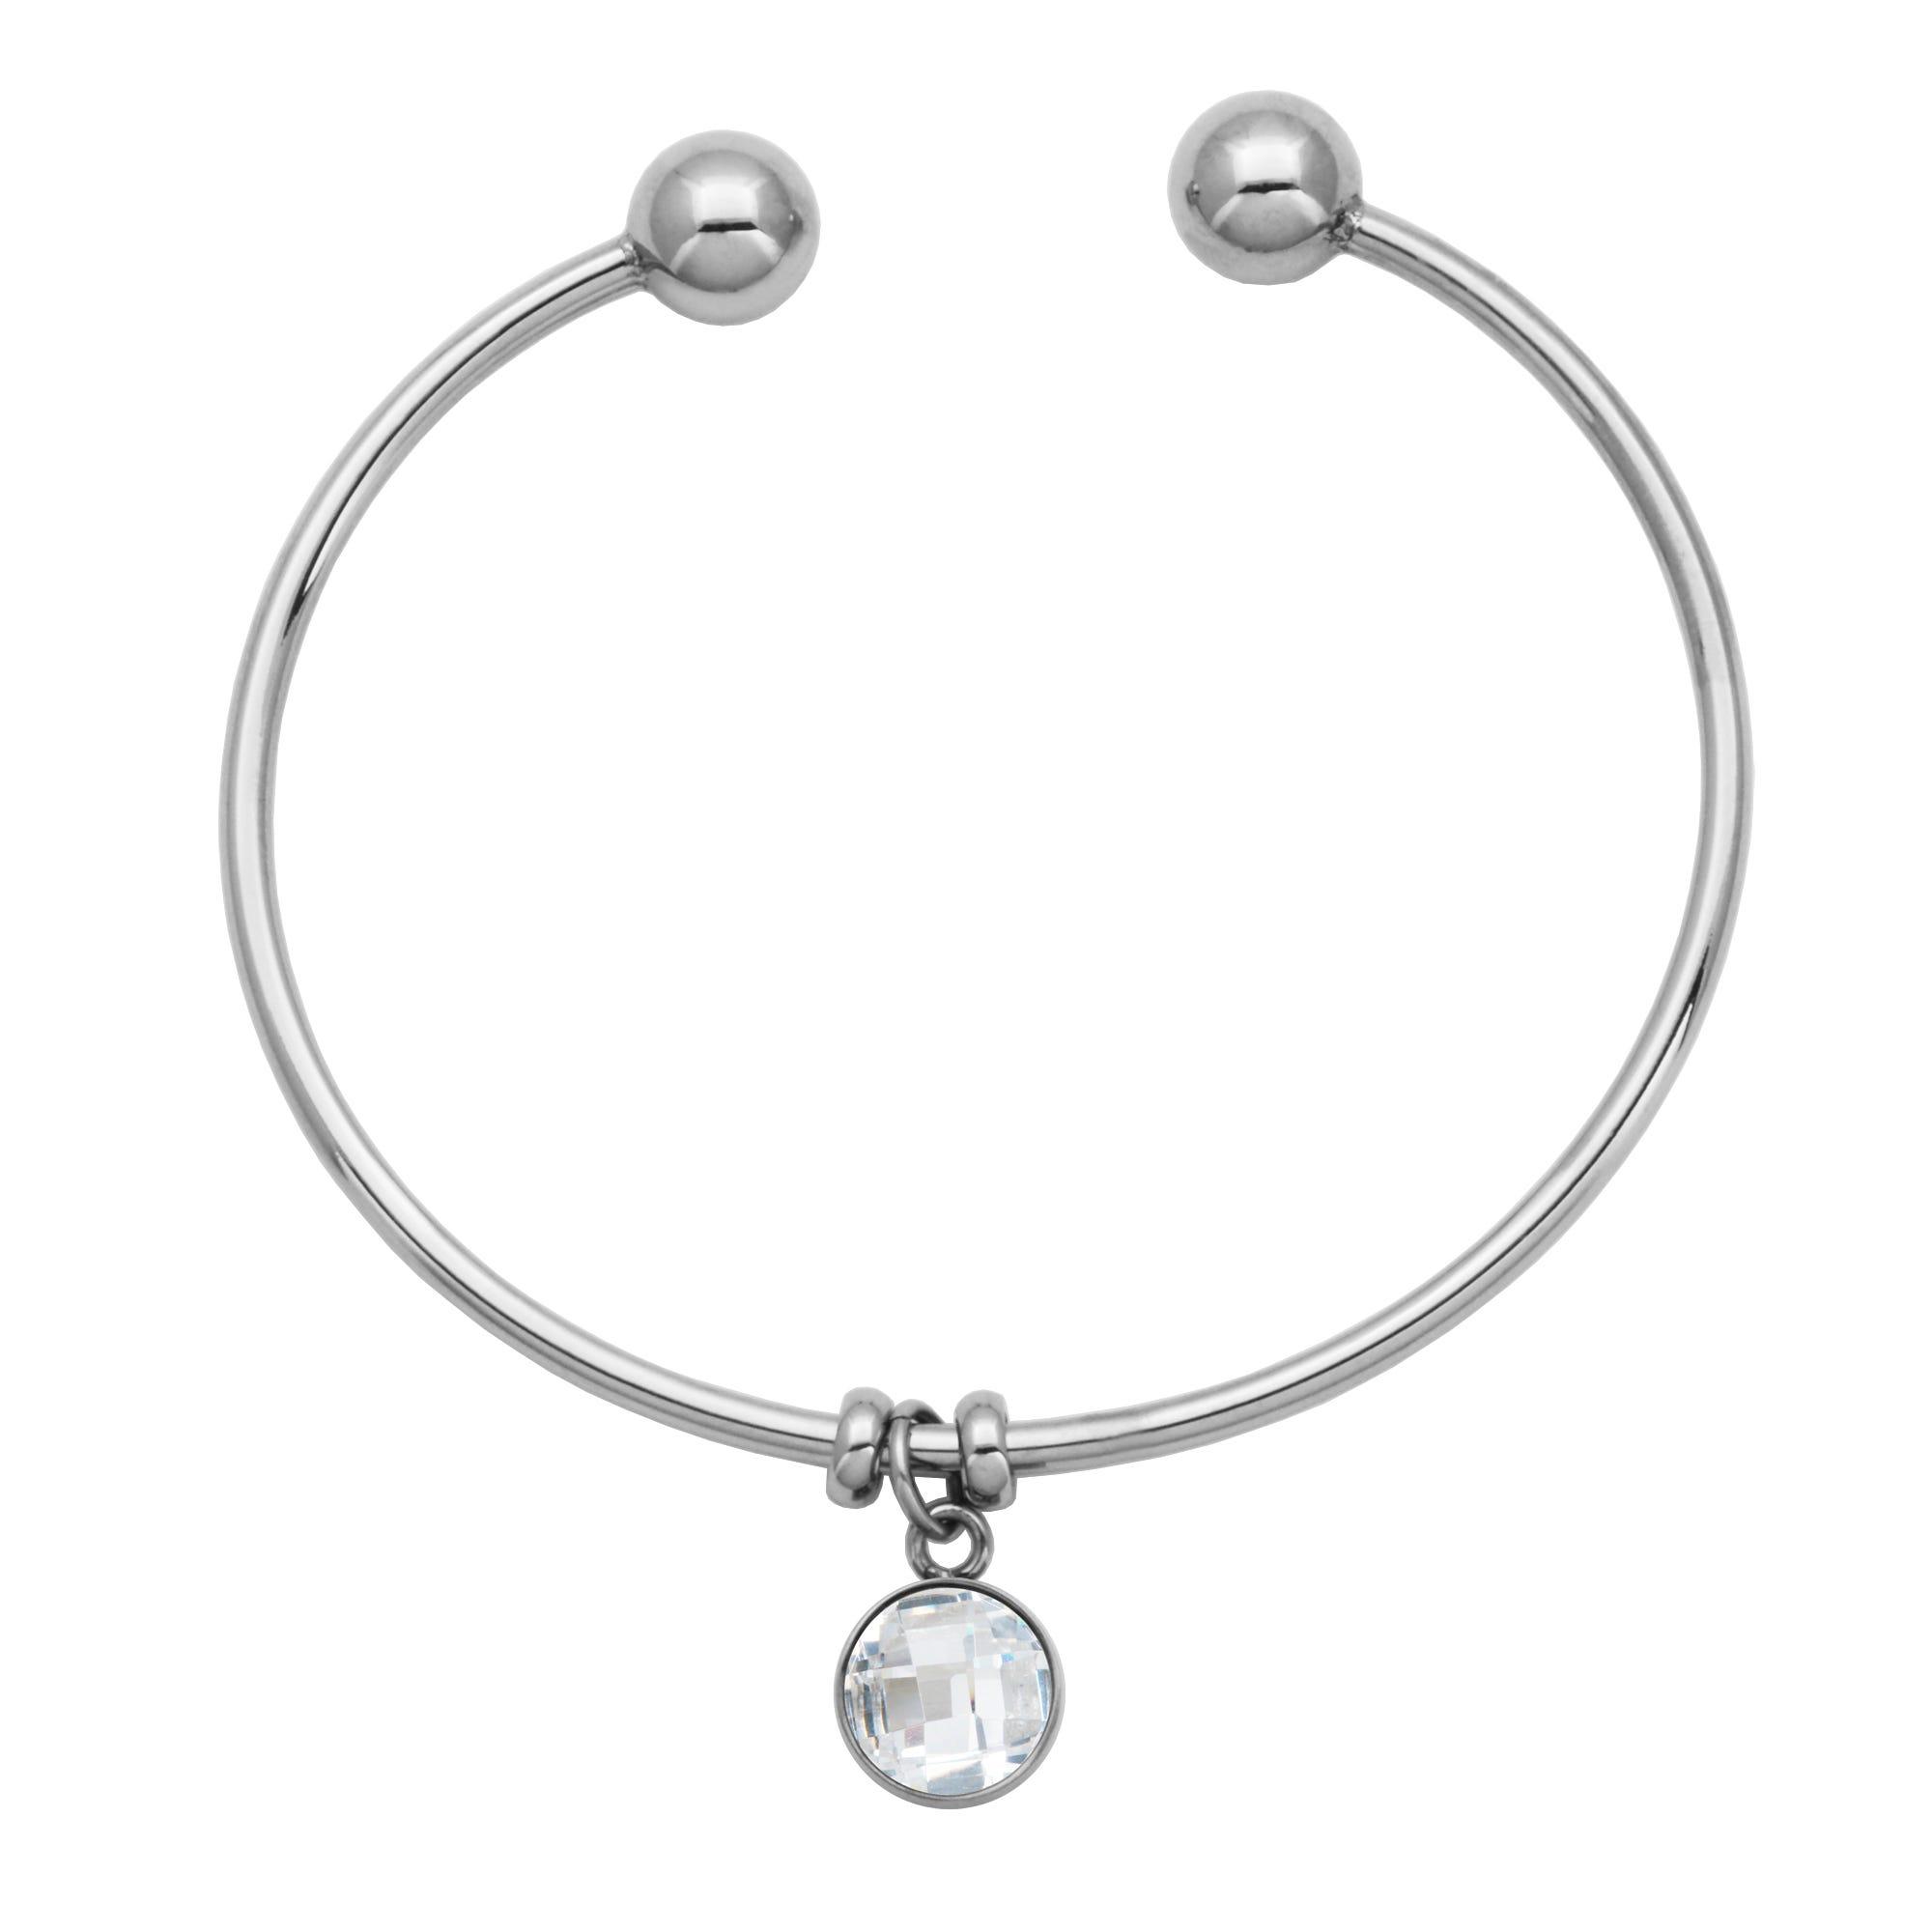 White Crystal Charm Flexible Bangle Bracelet